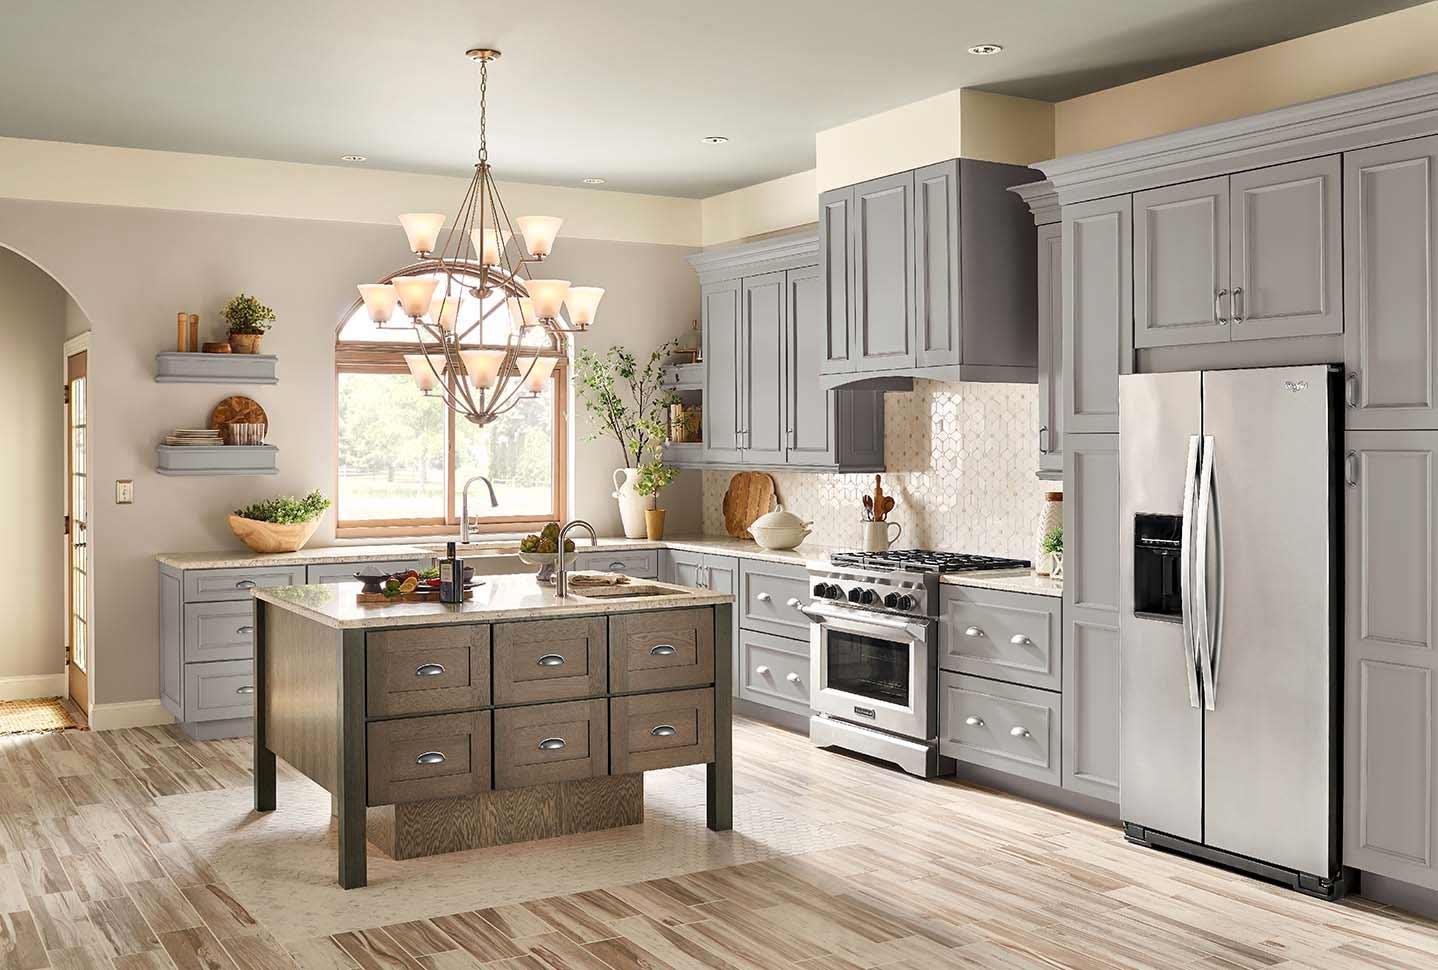 Merrilat Lucca Pebble Grey Mapple and Montresano Baltic Oak kitchen cabinetry